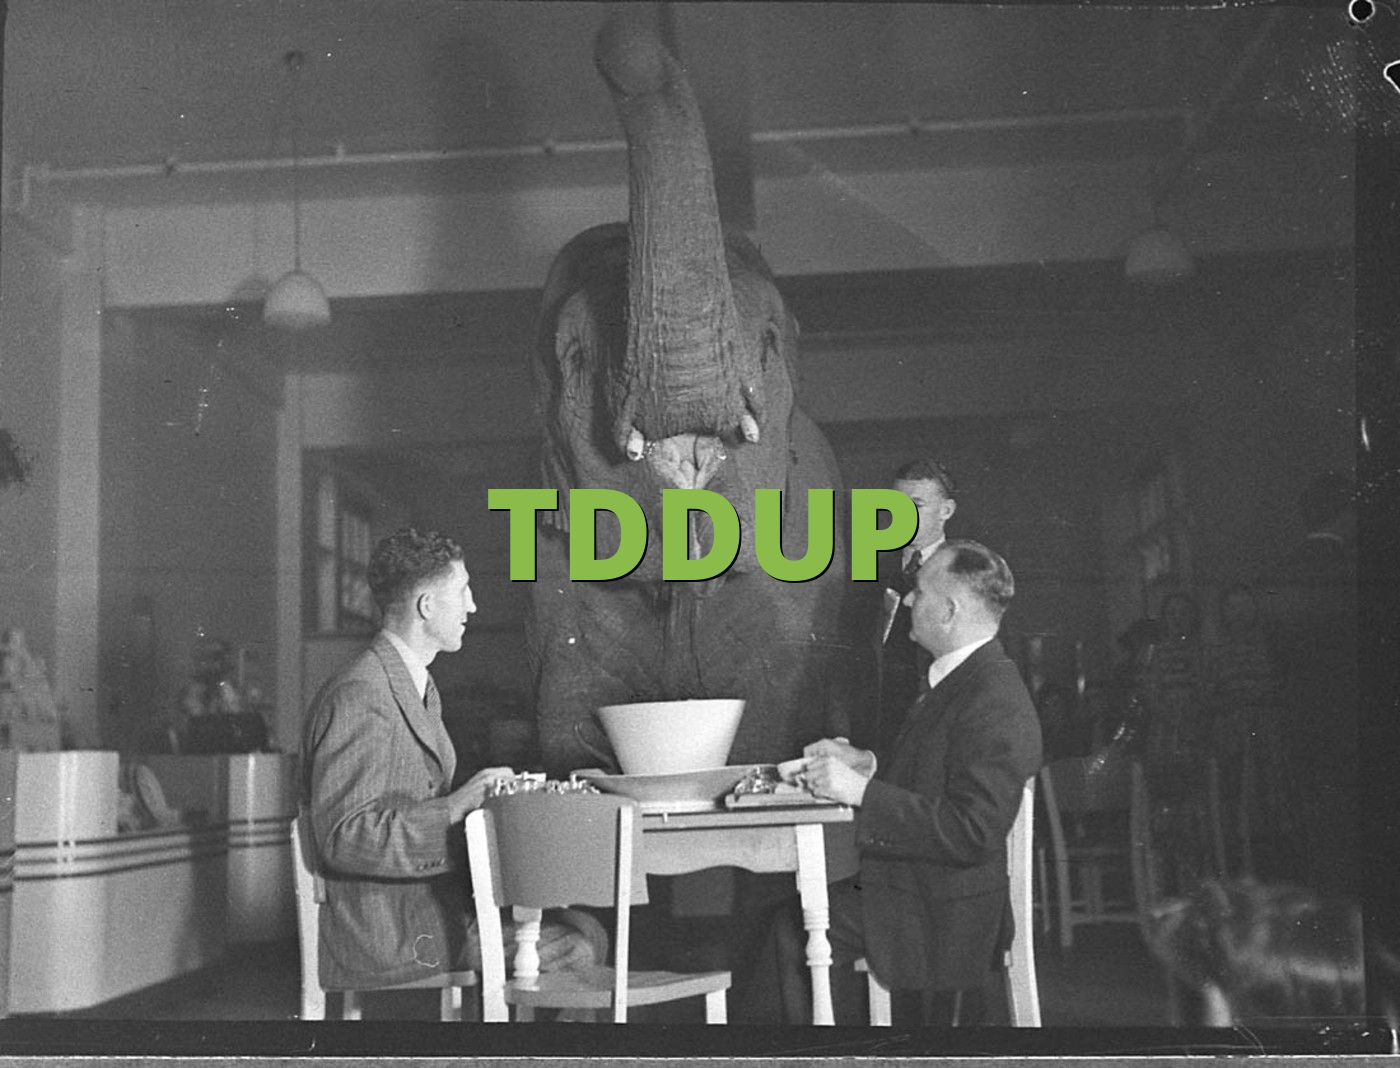 TDDUP